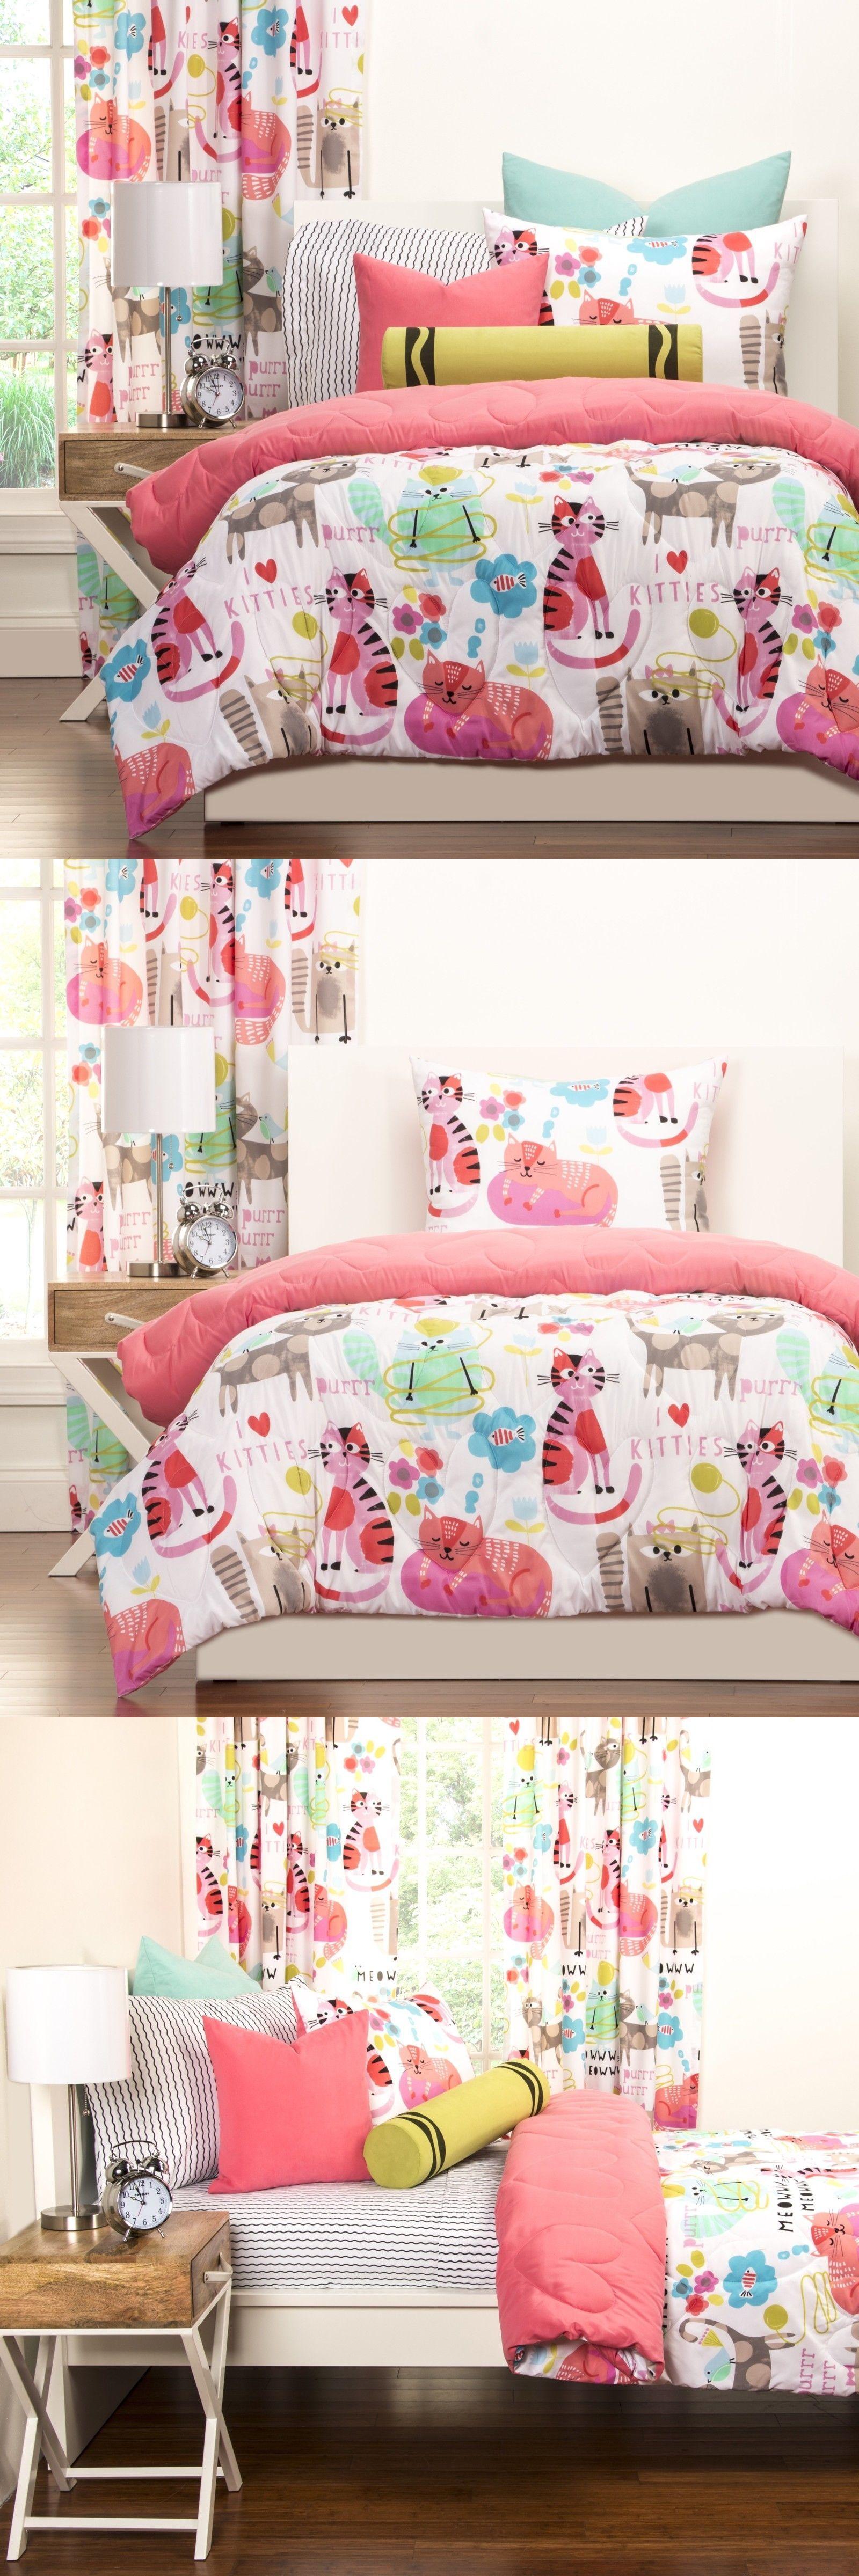 Canopies And Netting 176986 Kitten Cat Pink Brushed Microfiber 3pc Comforter Sham Girls Set Pink Full Queen Comforters And Sets Comforter Sets Pink Brushes